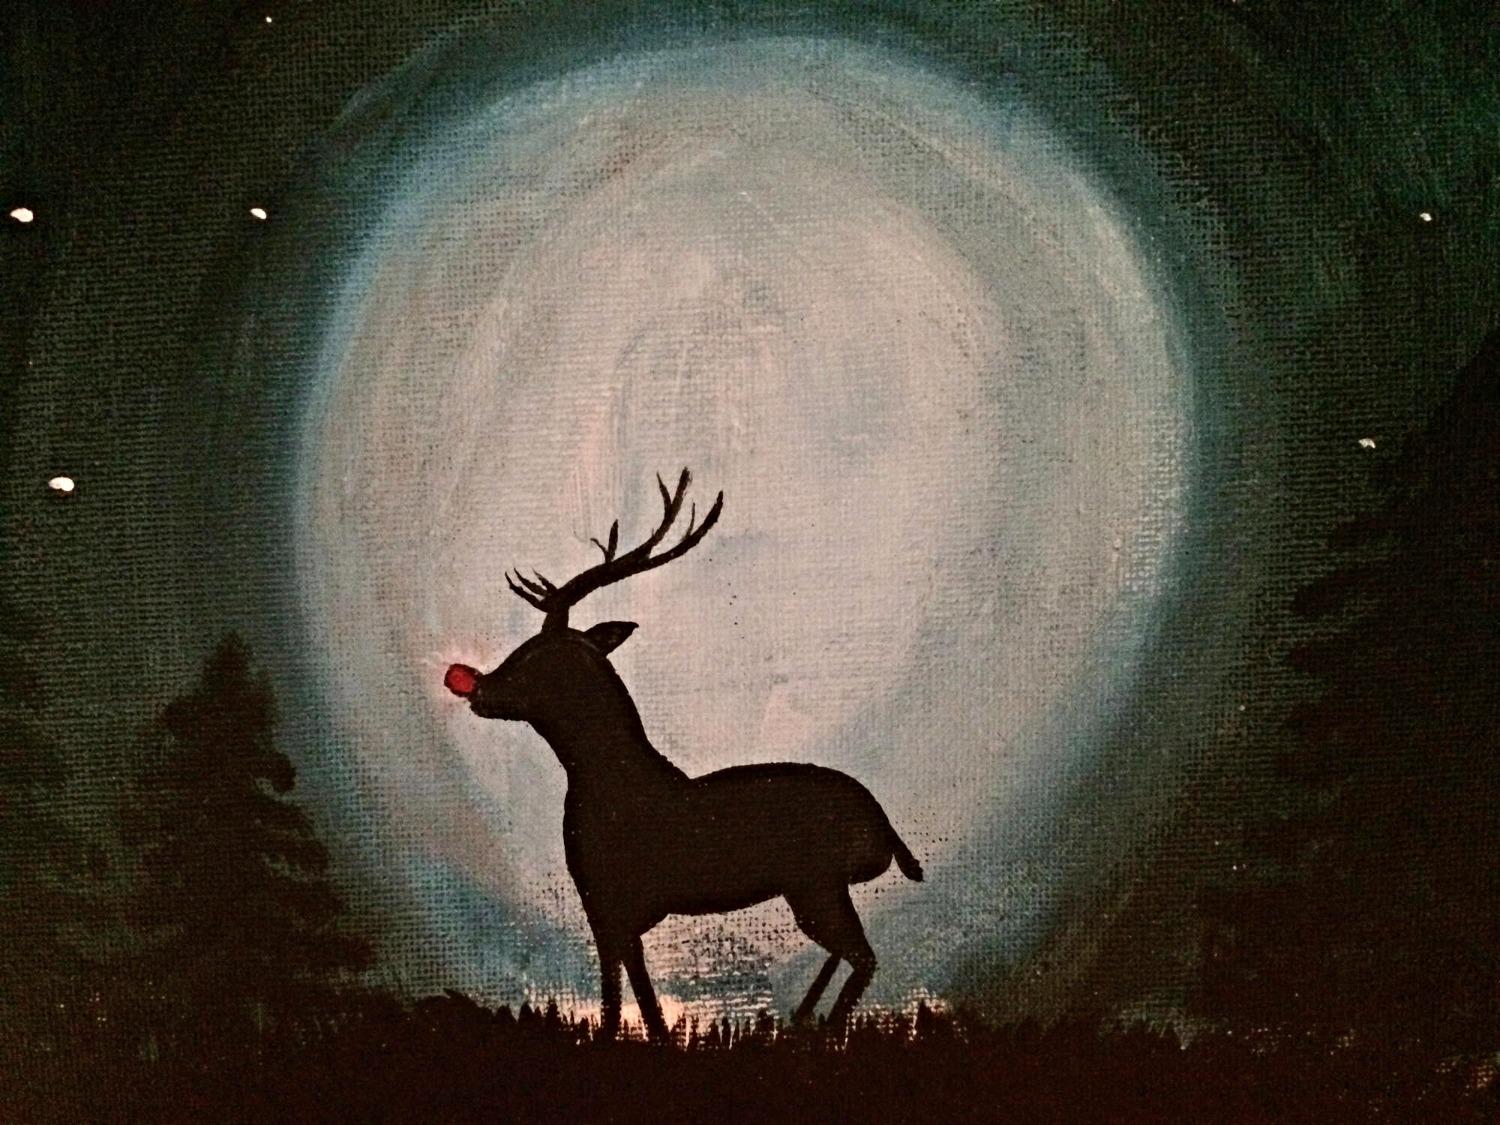 Moonlit Rudolph